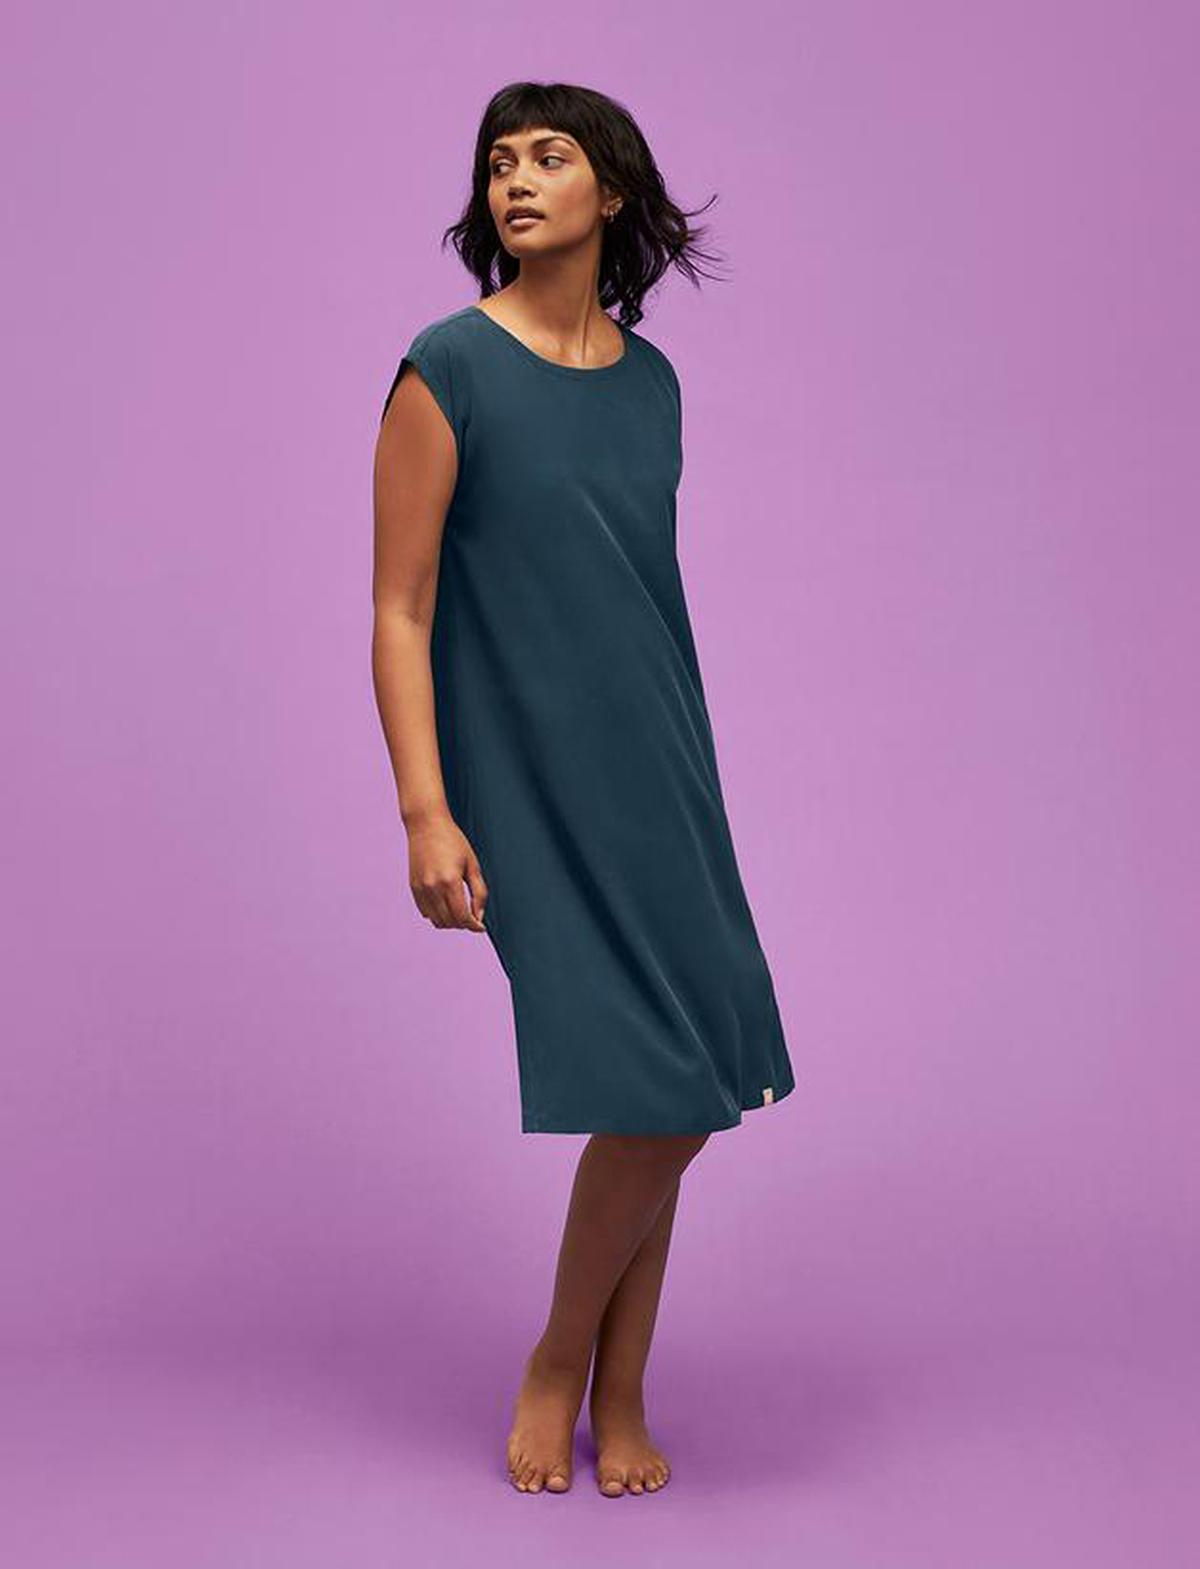 thirdlove-washable-silk-sleep-tee-dress